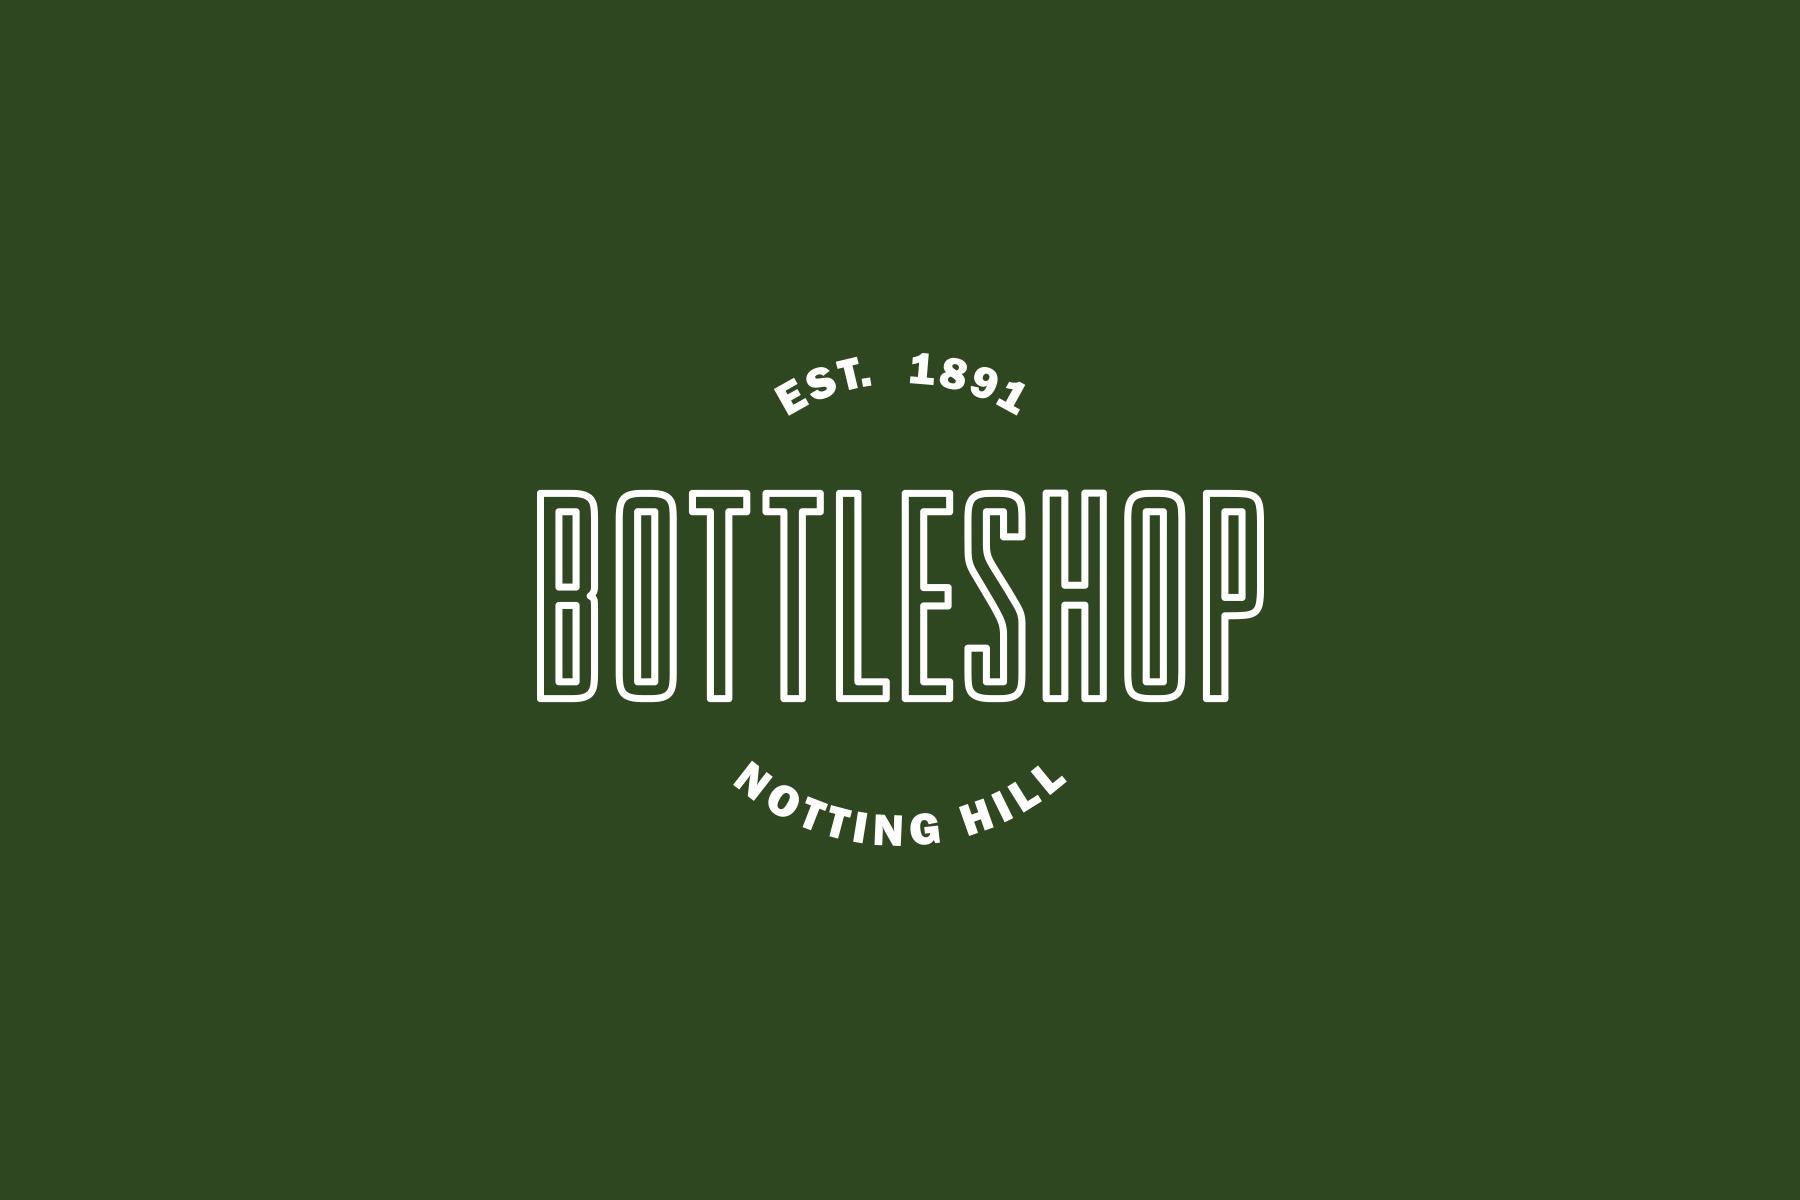 Notting Hill Hotel The Bottleshop